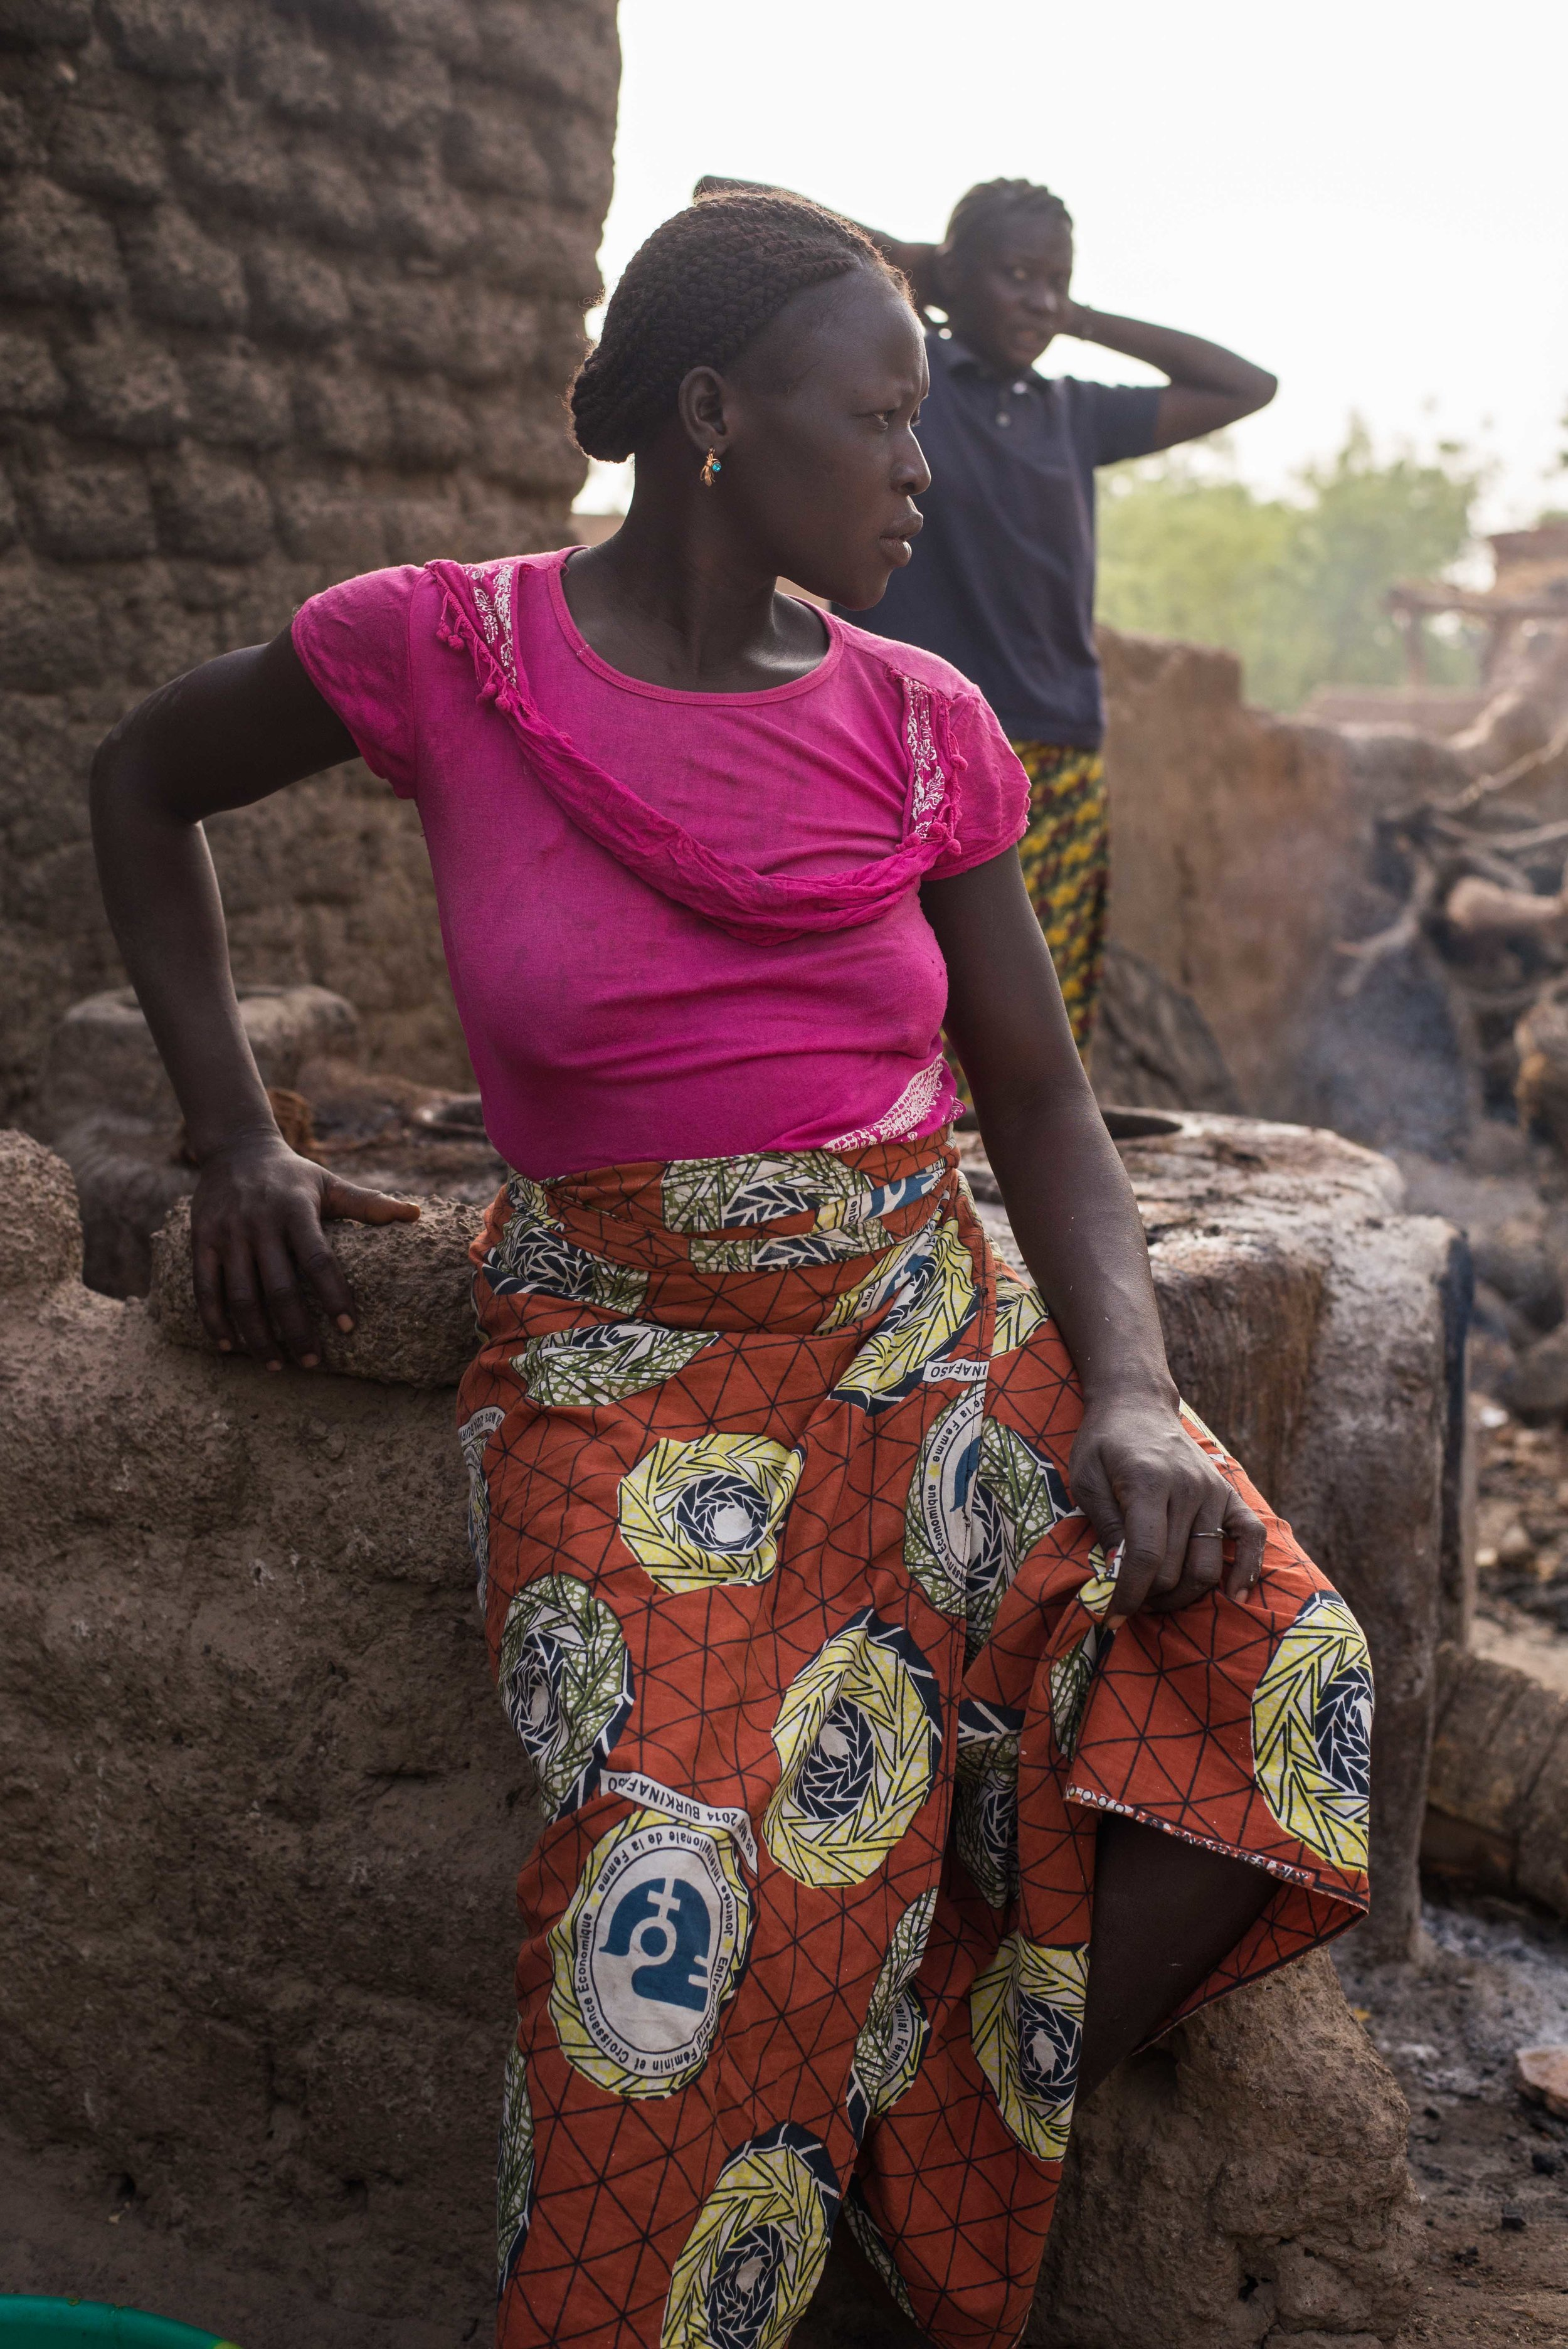 Making Dolo, Burkina Faso, 2015